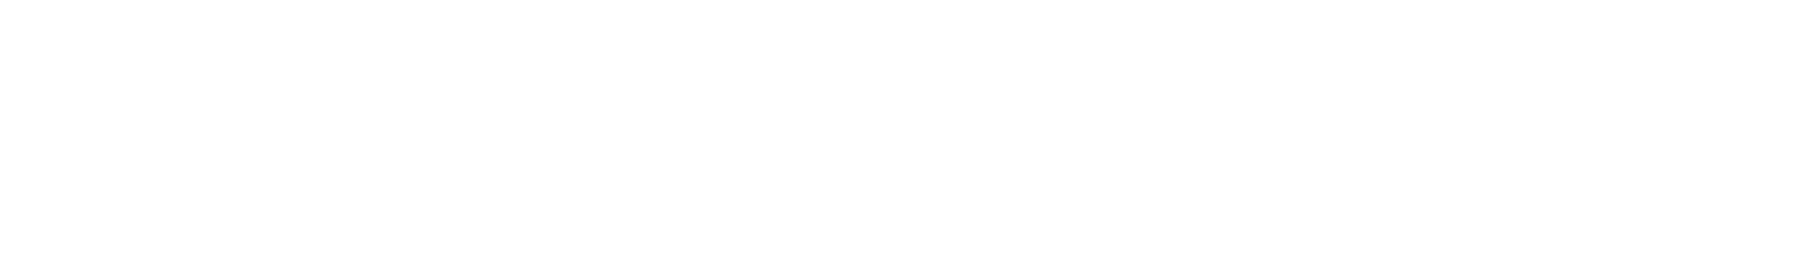 pad4 125